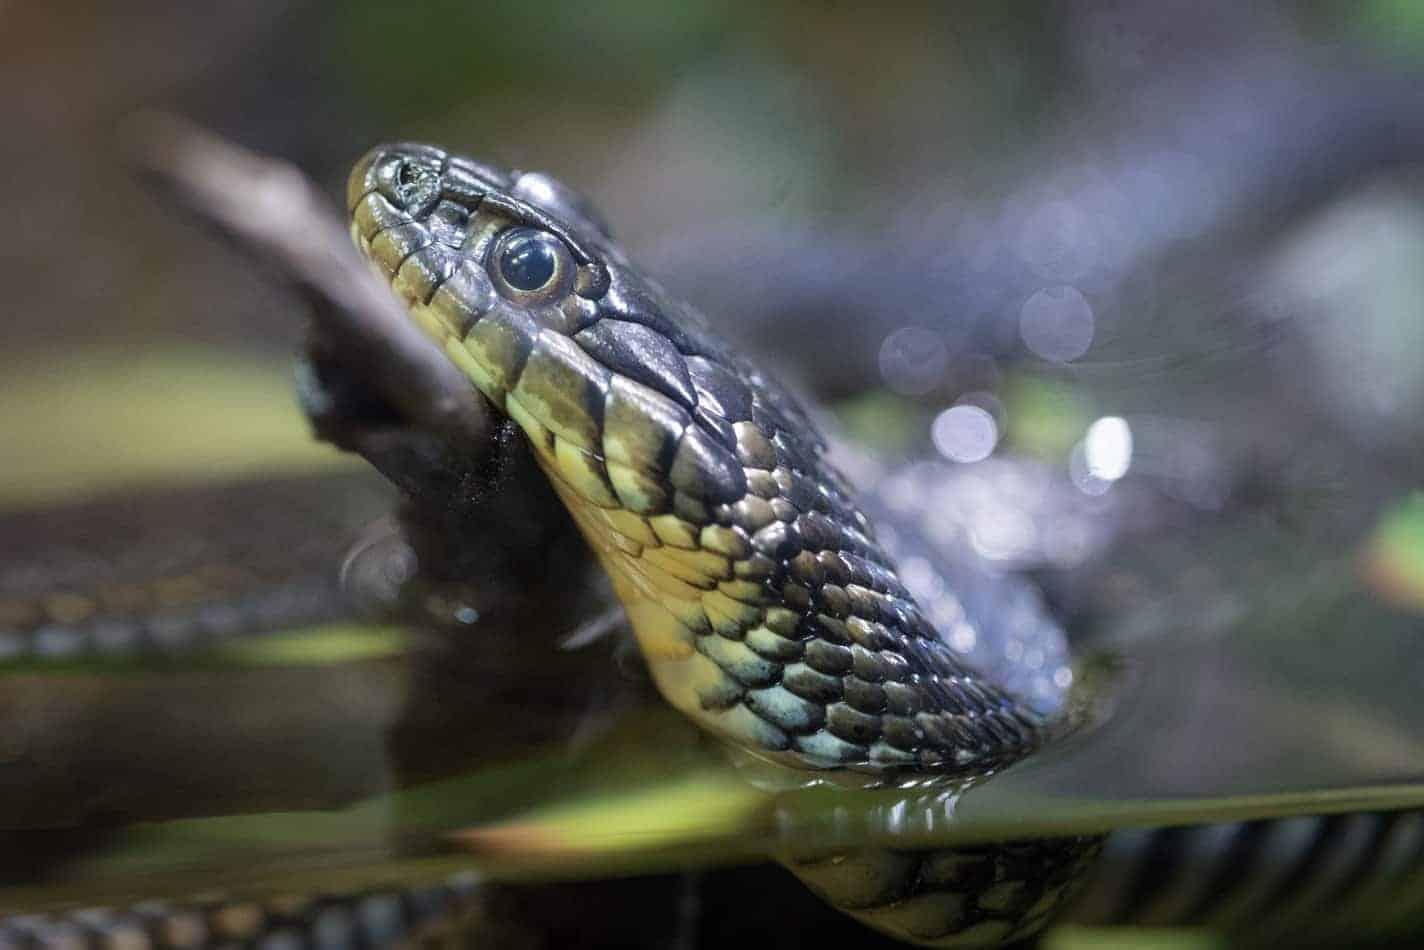 Do Garter Snakes Make Good Pets?